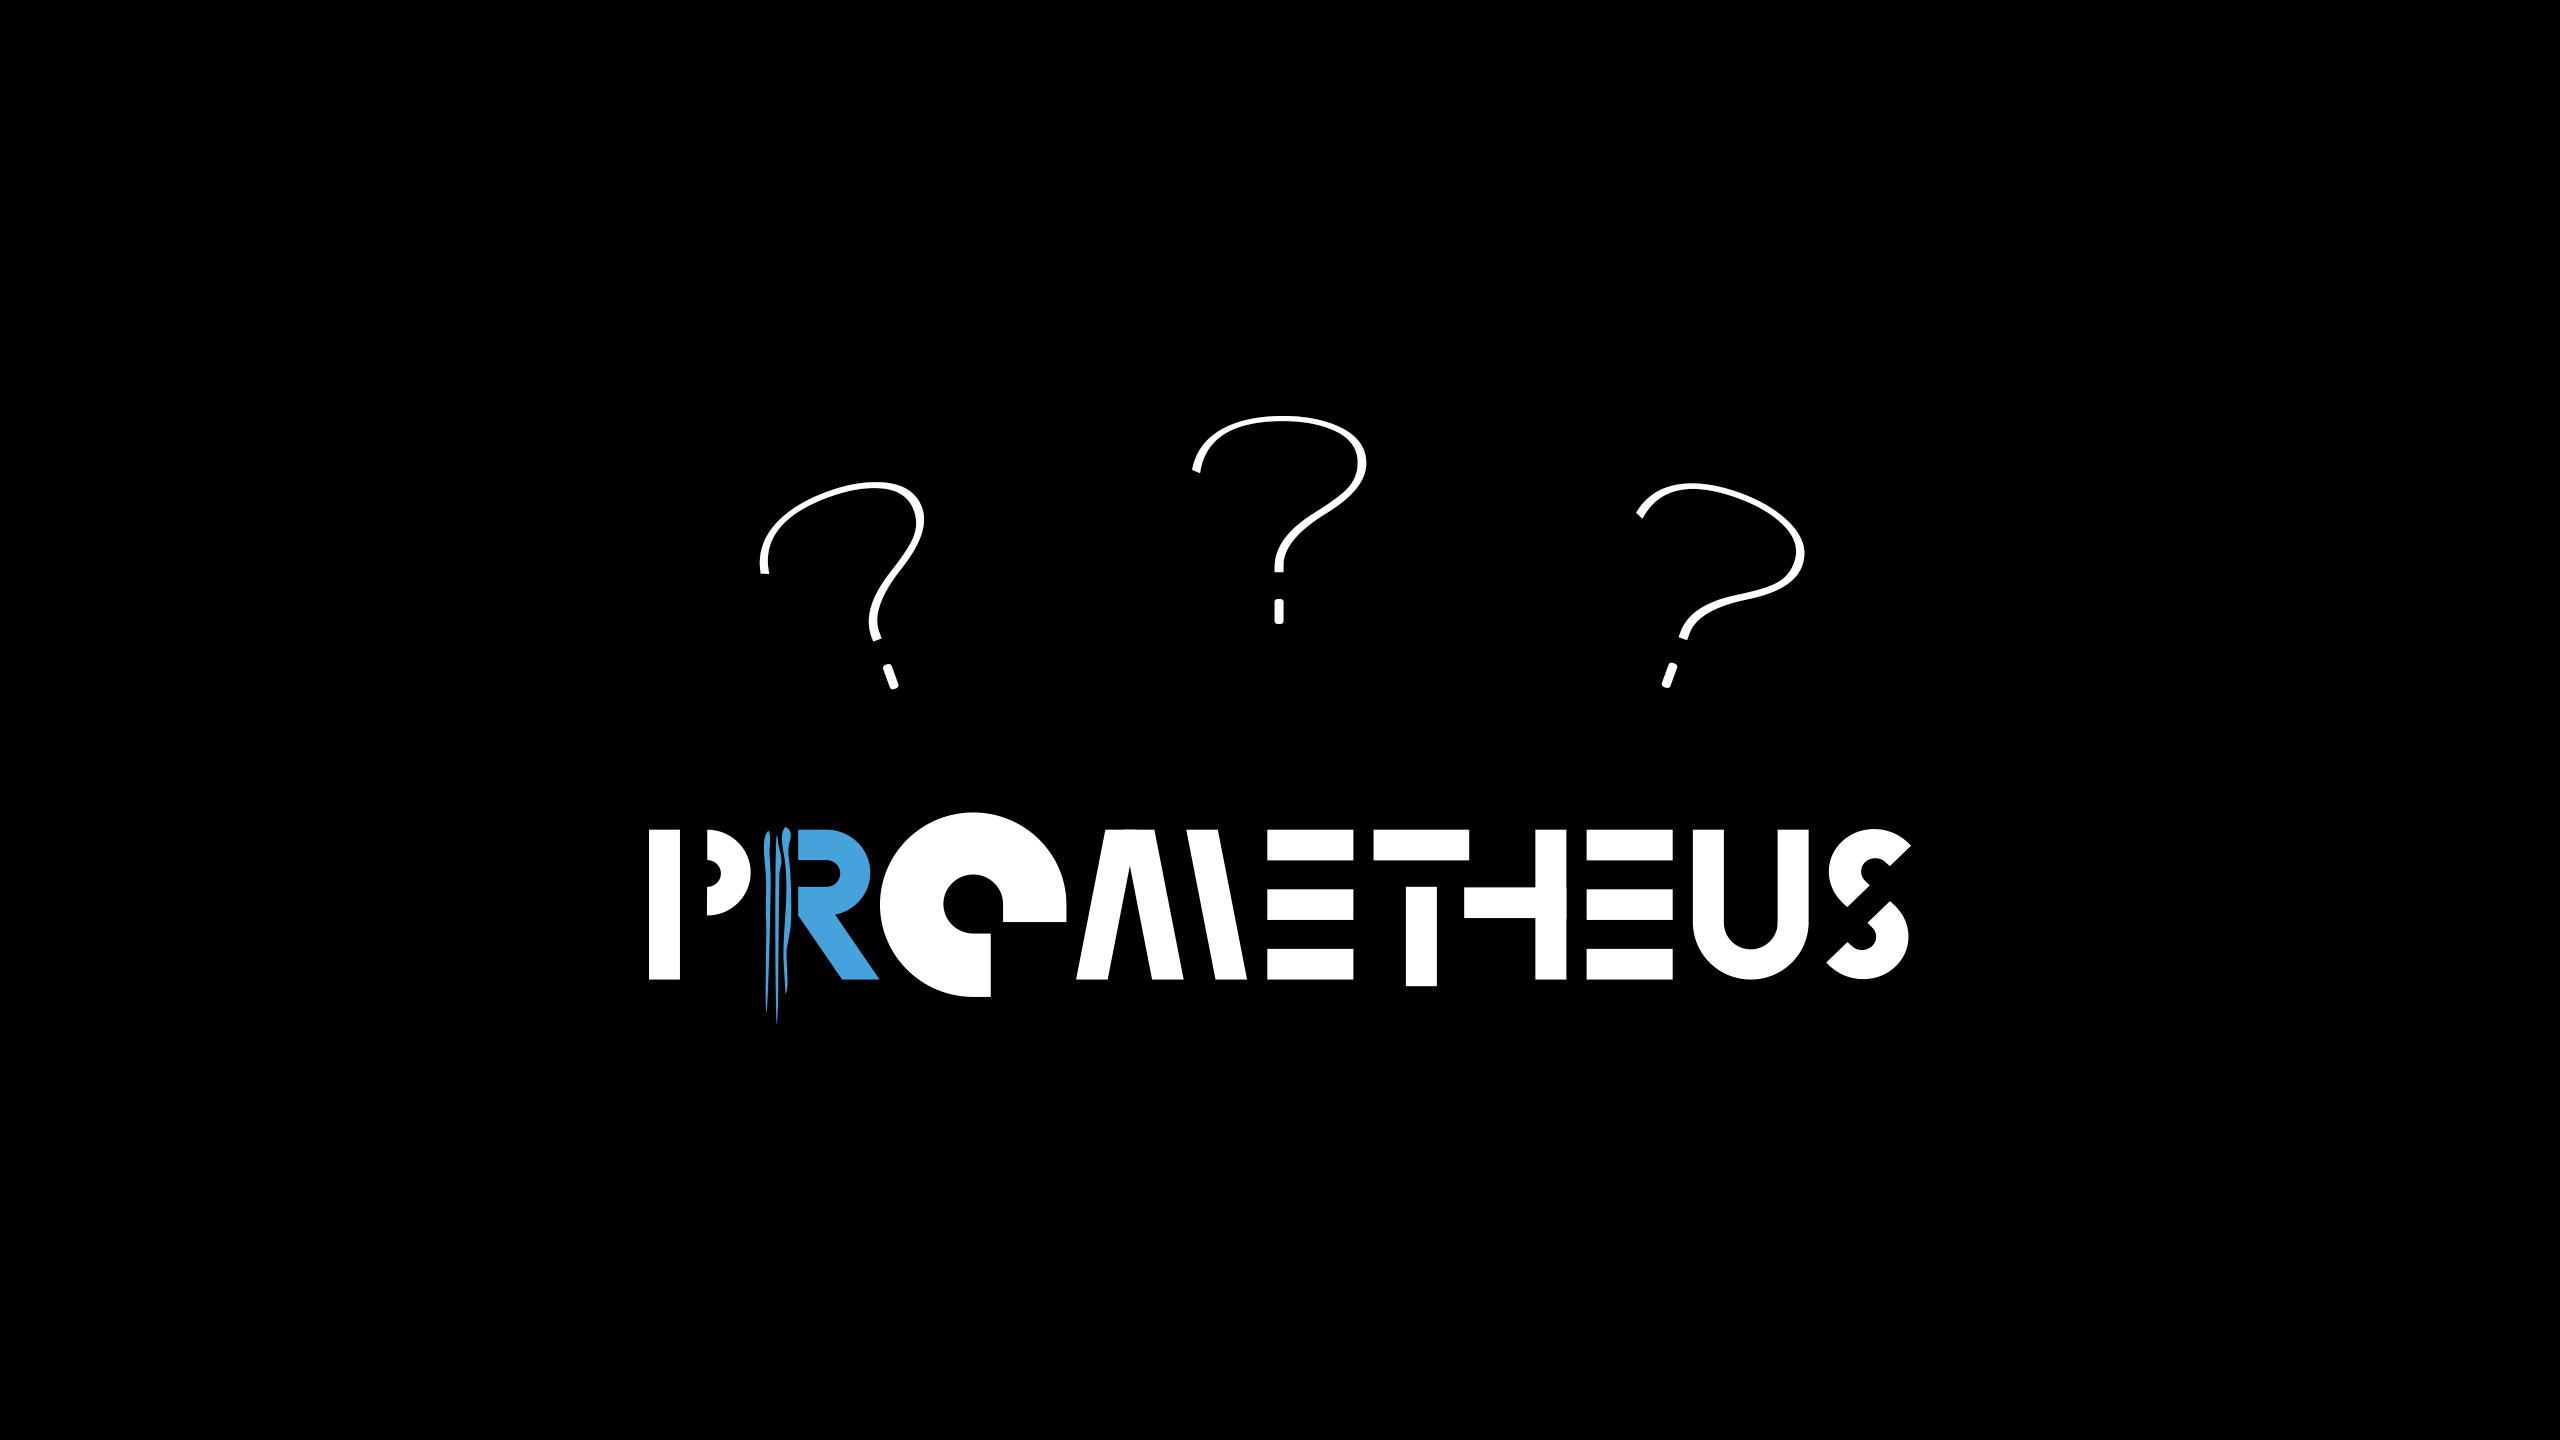 Prometheus-12-Teaser-1440p